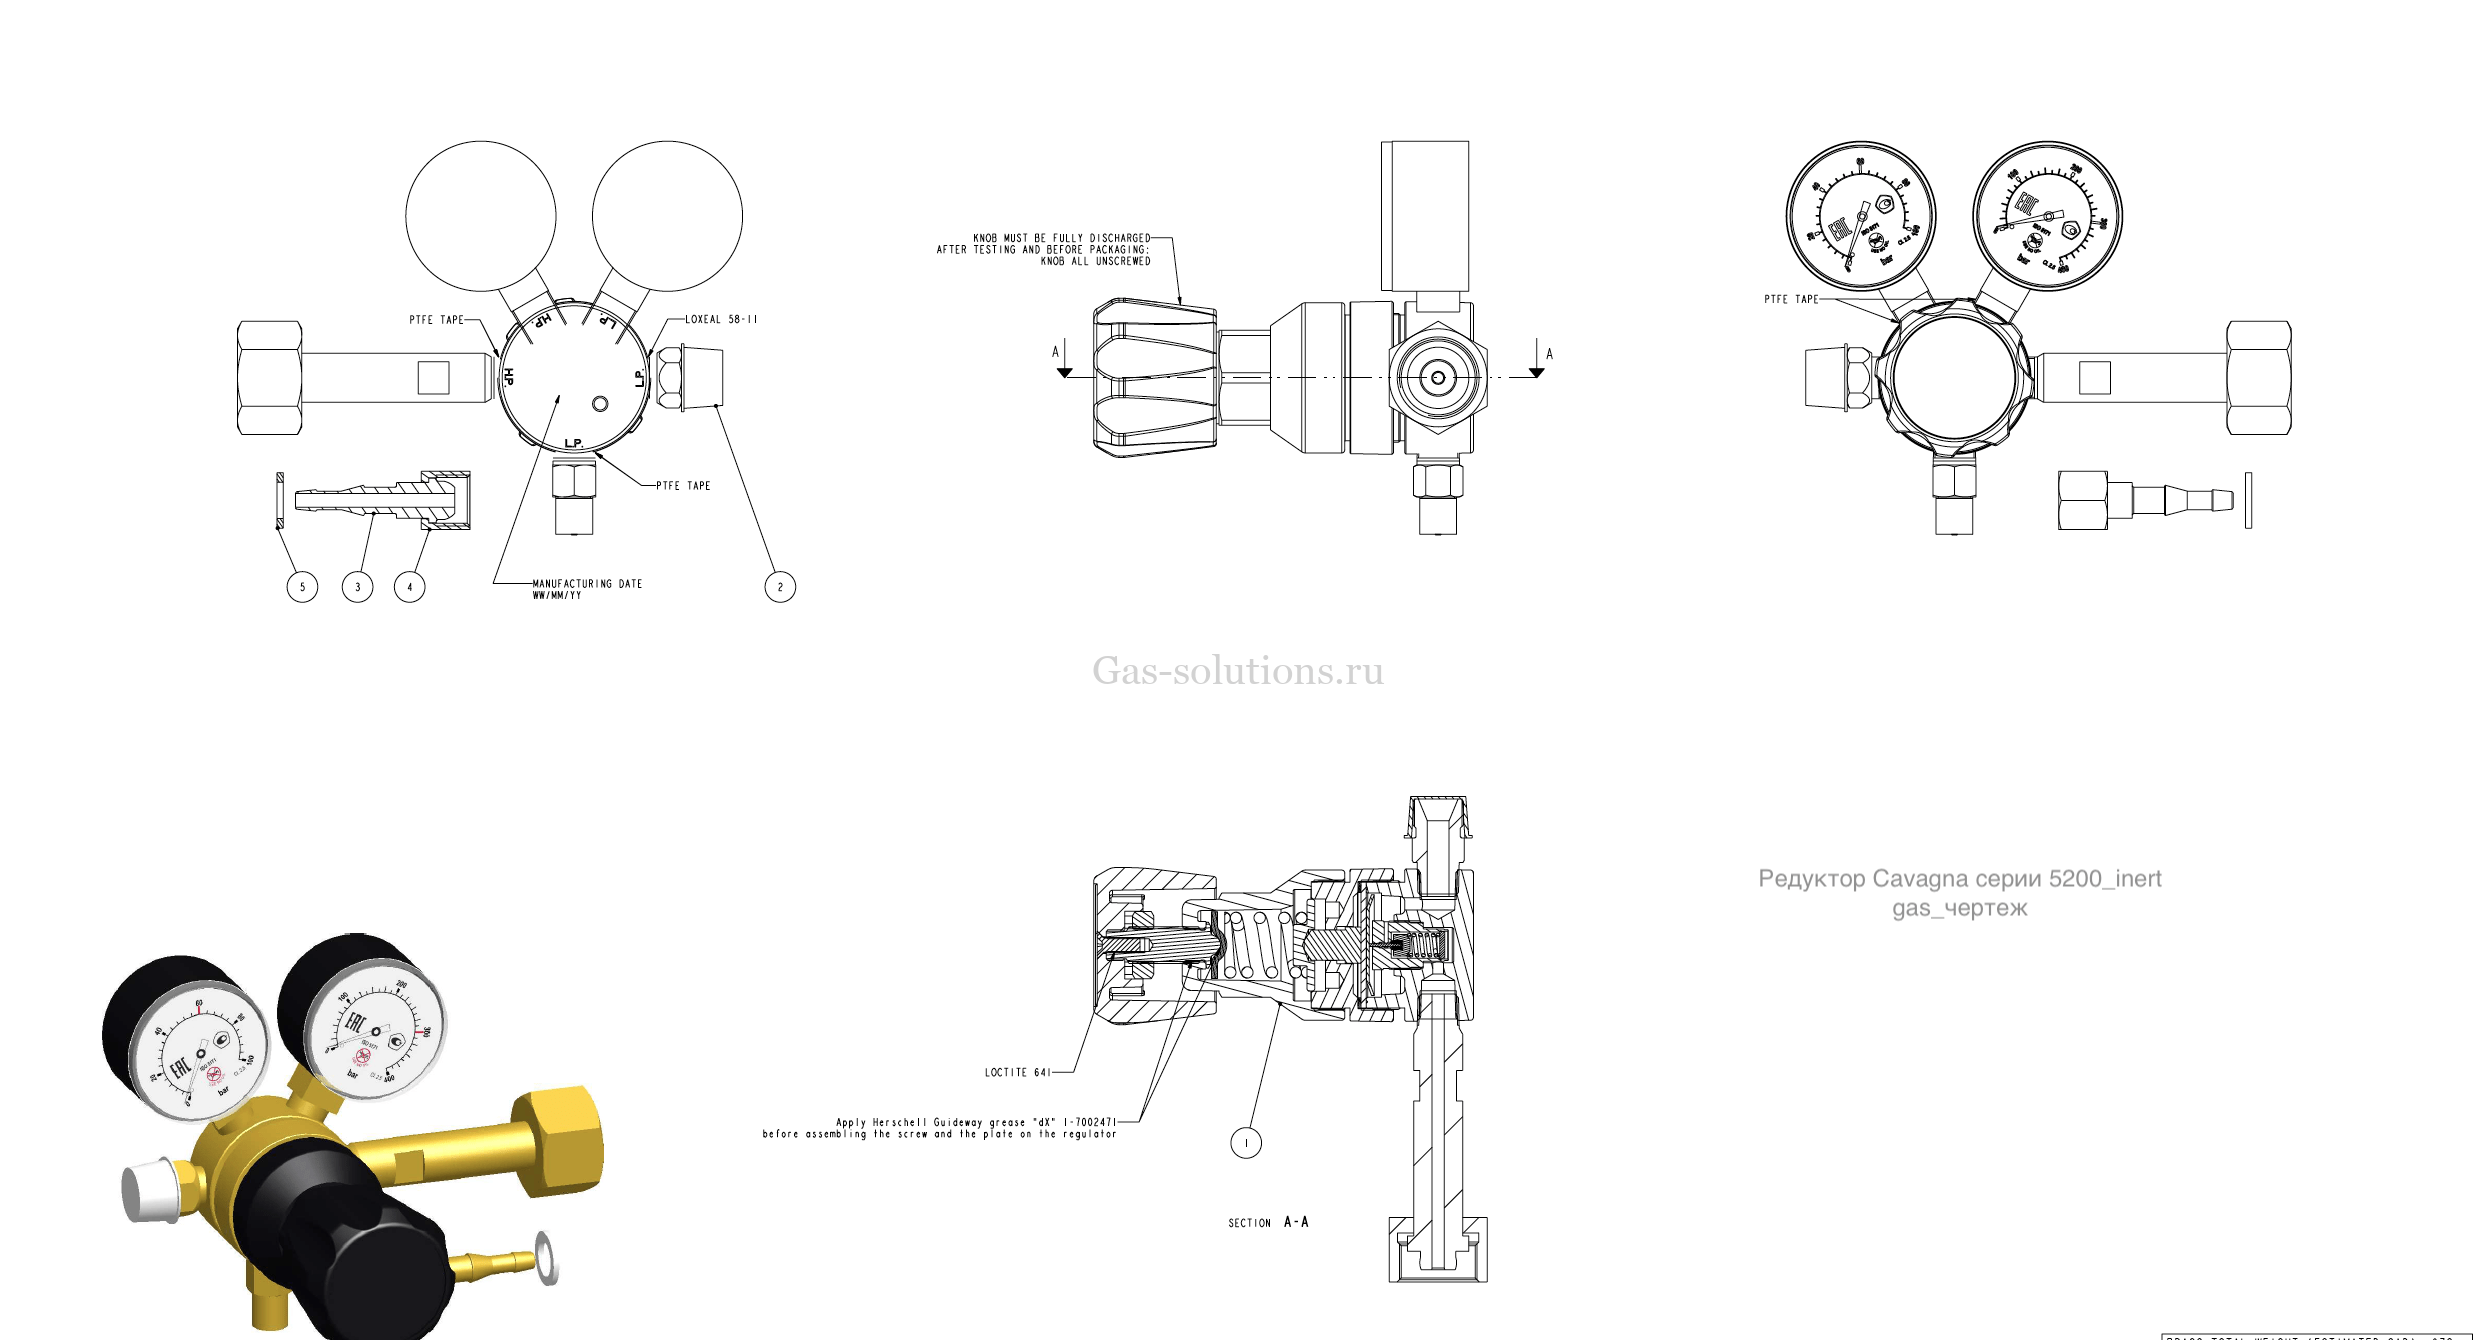 Редуктор Cavagna серии 5200_inert gas_чертеж